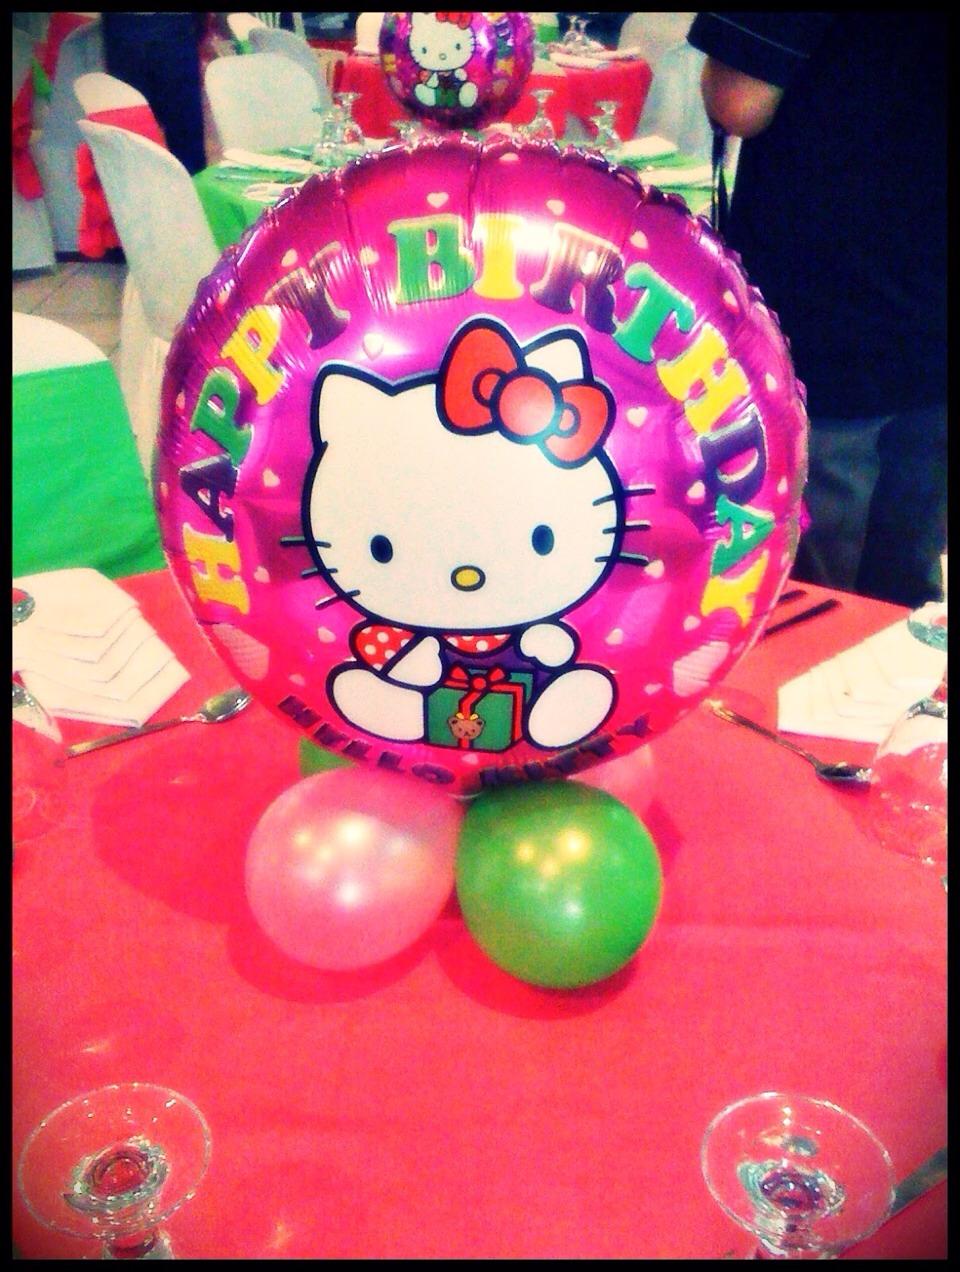 Maries Manor Hello Kitty: Cheap Hello Kitty Inspired Centerpiece By Regel Marie